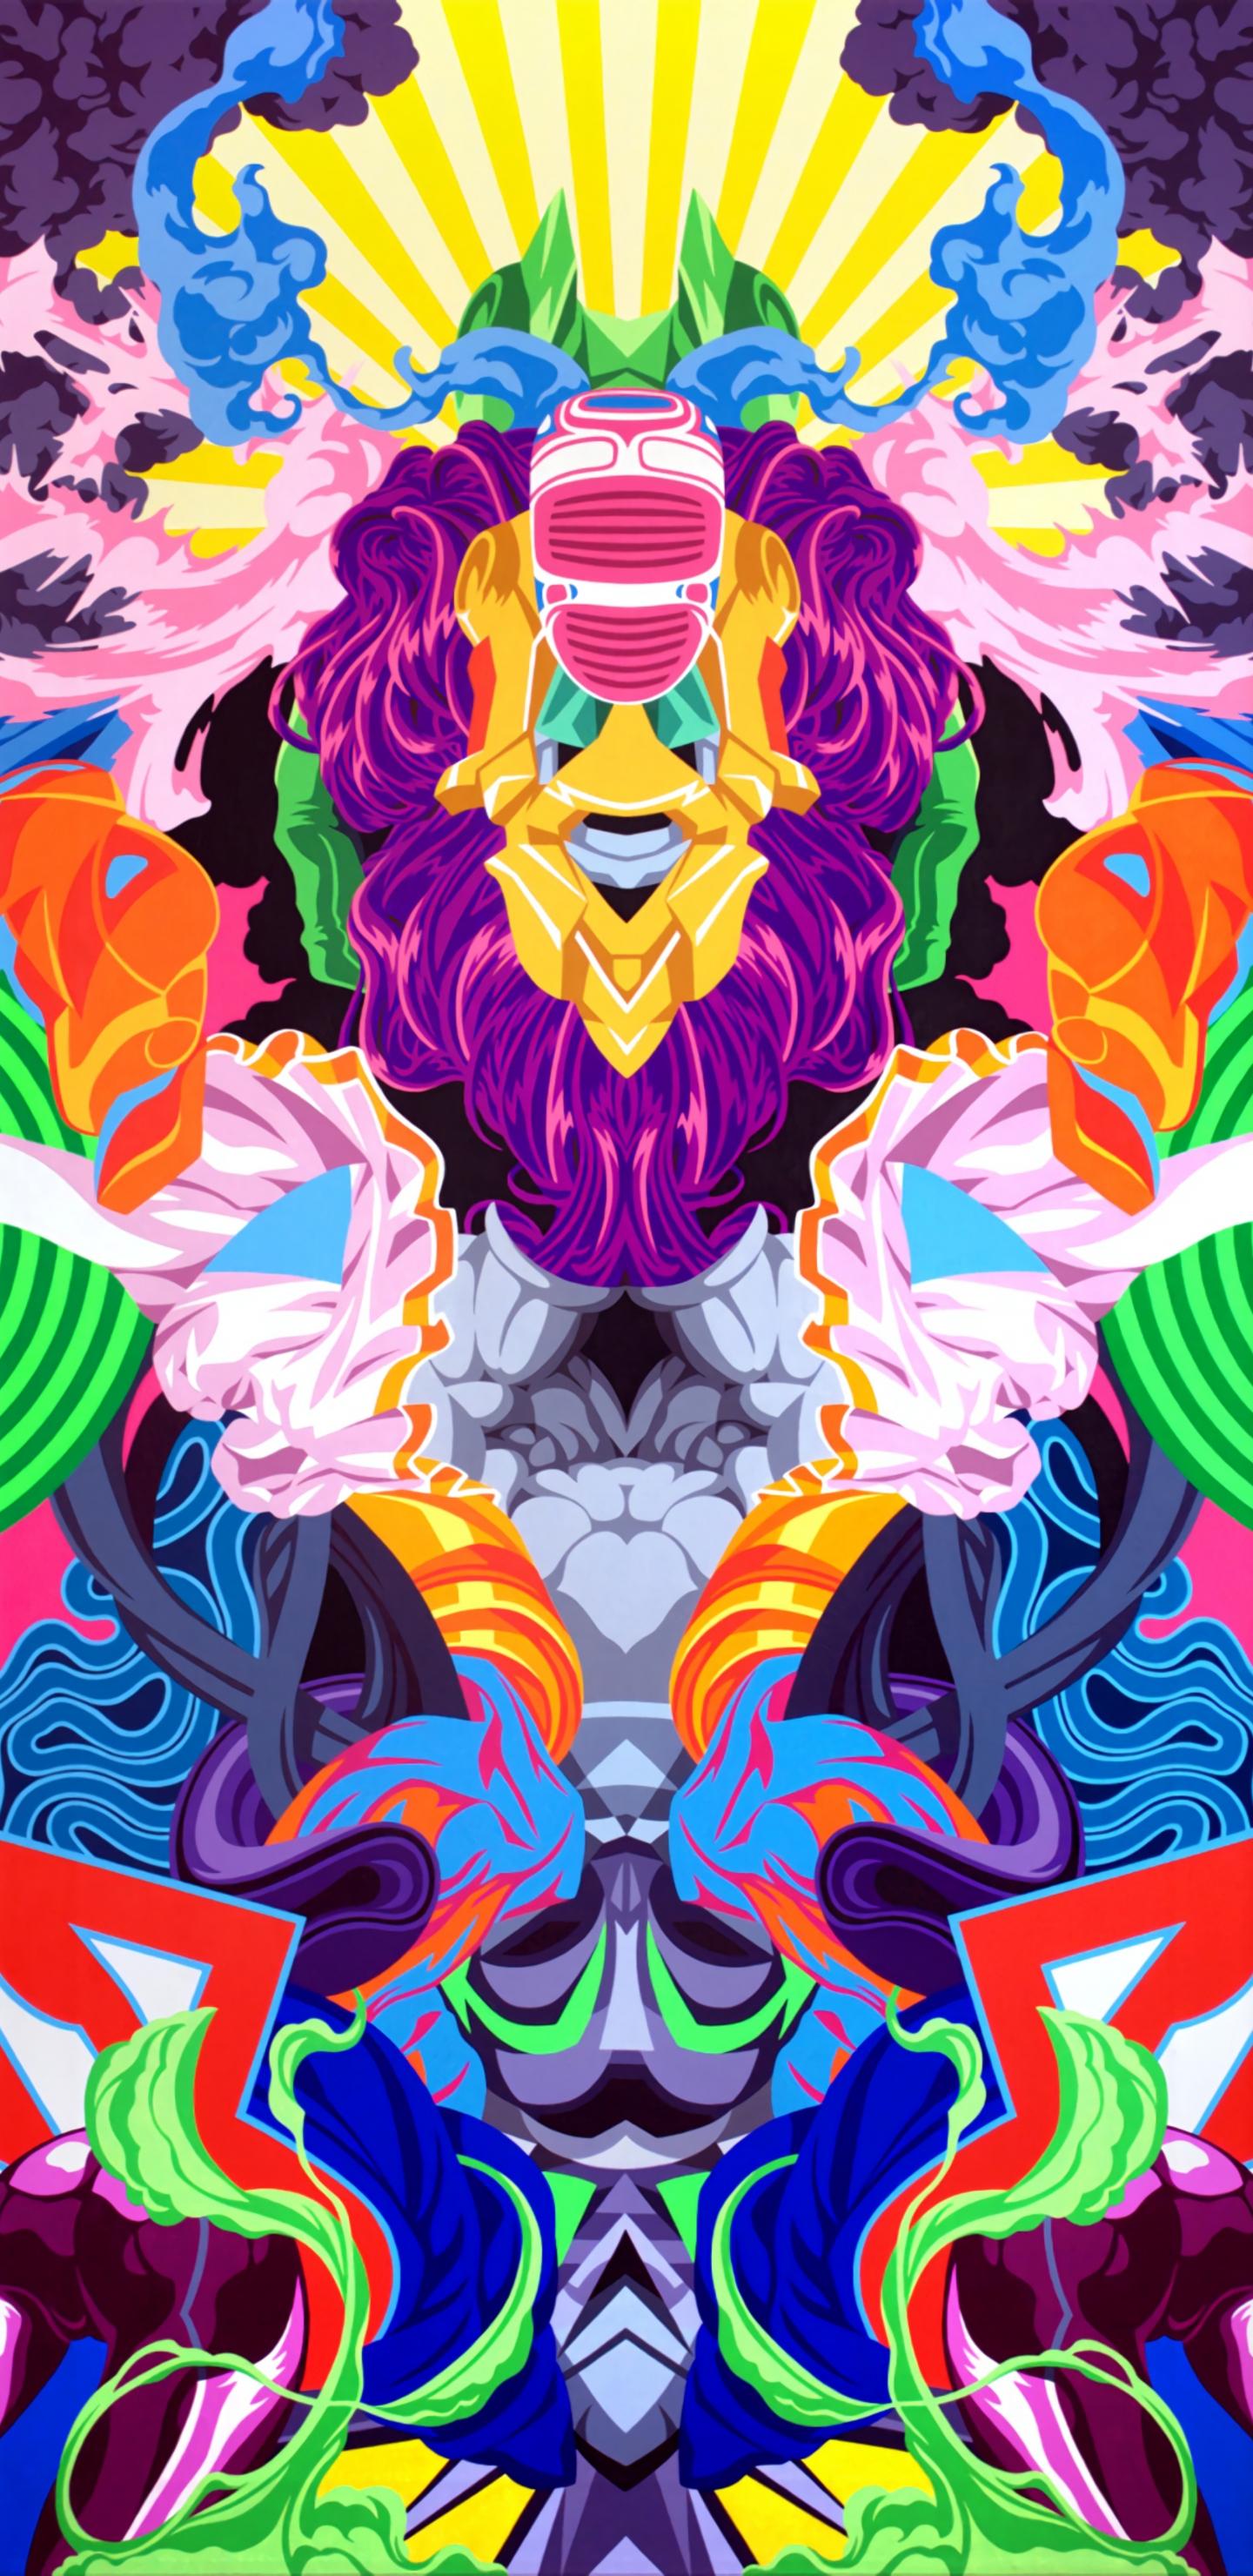 colorful motley psychedelic art